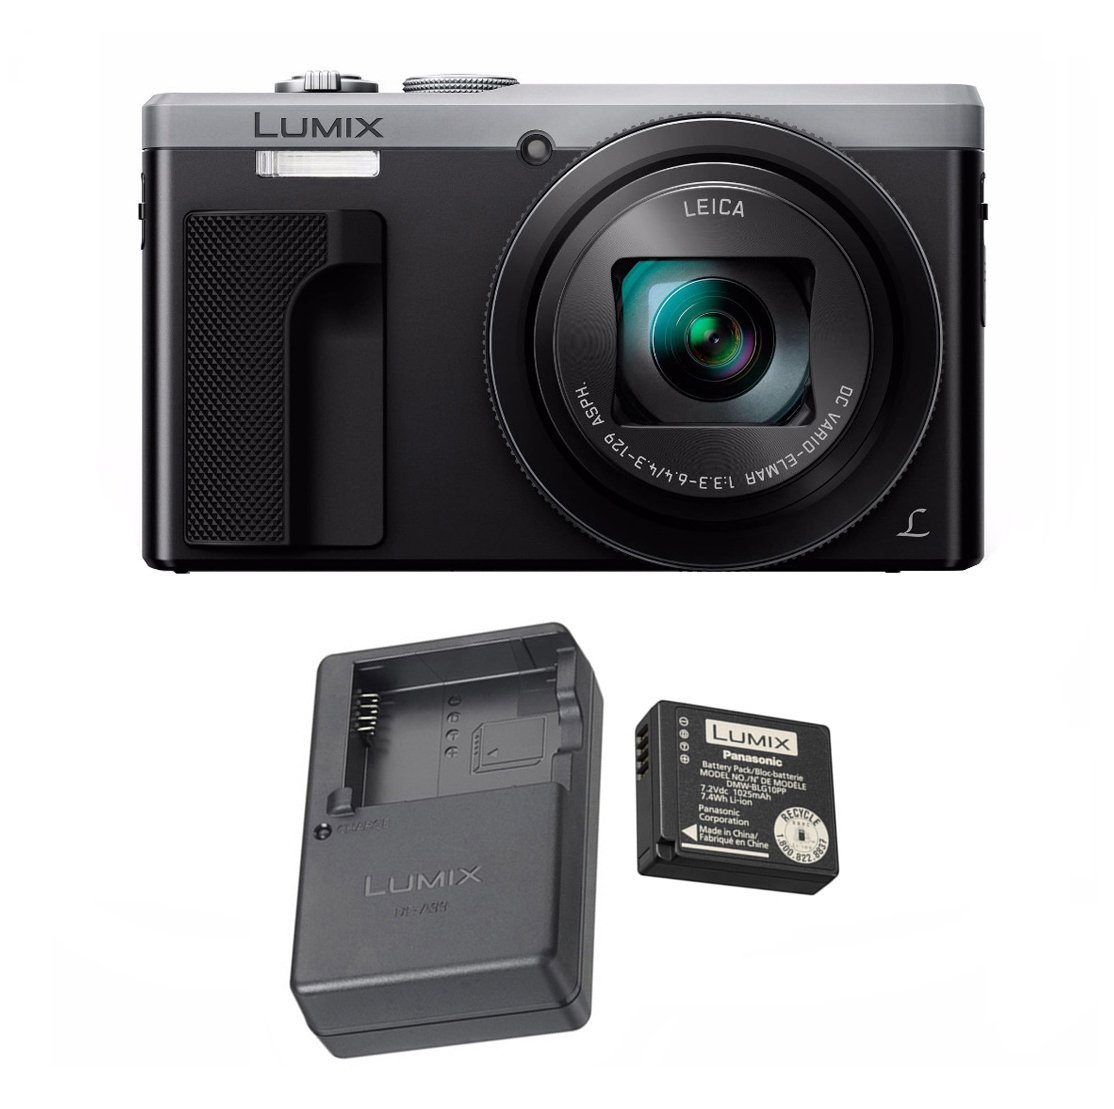 Panasonic LUMIX ZS60, 4K, WiFi, Leica Lens (Silver) + OEM EXTRA Panasonic DMW-ZSTRV Battery & Charger Travel Kit by Panasonic